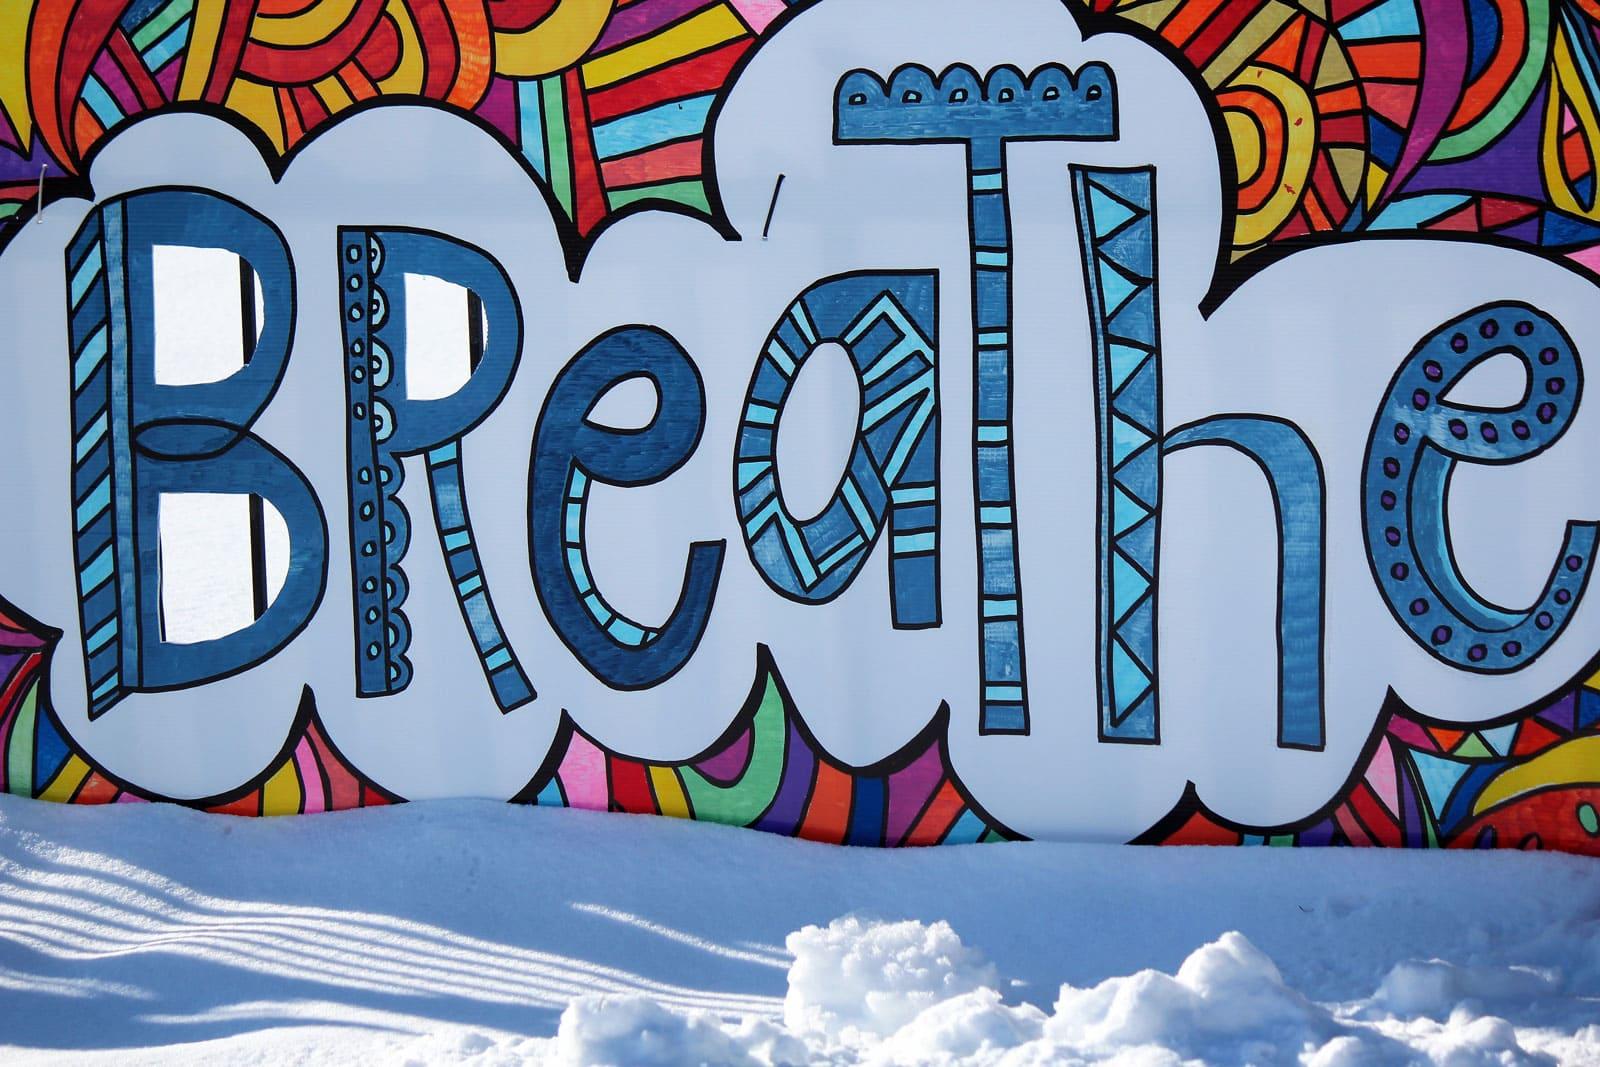 Breathe - Sign at Stittsville United Church